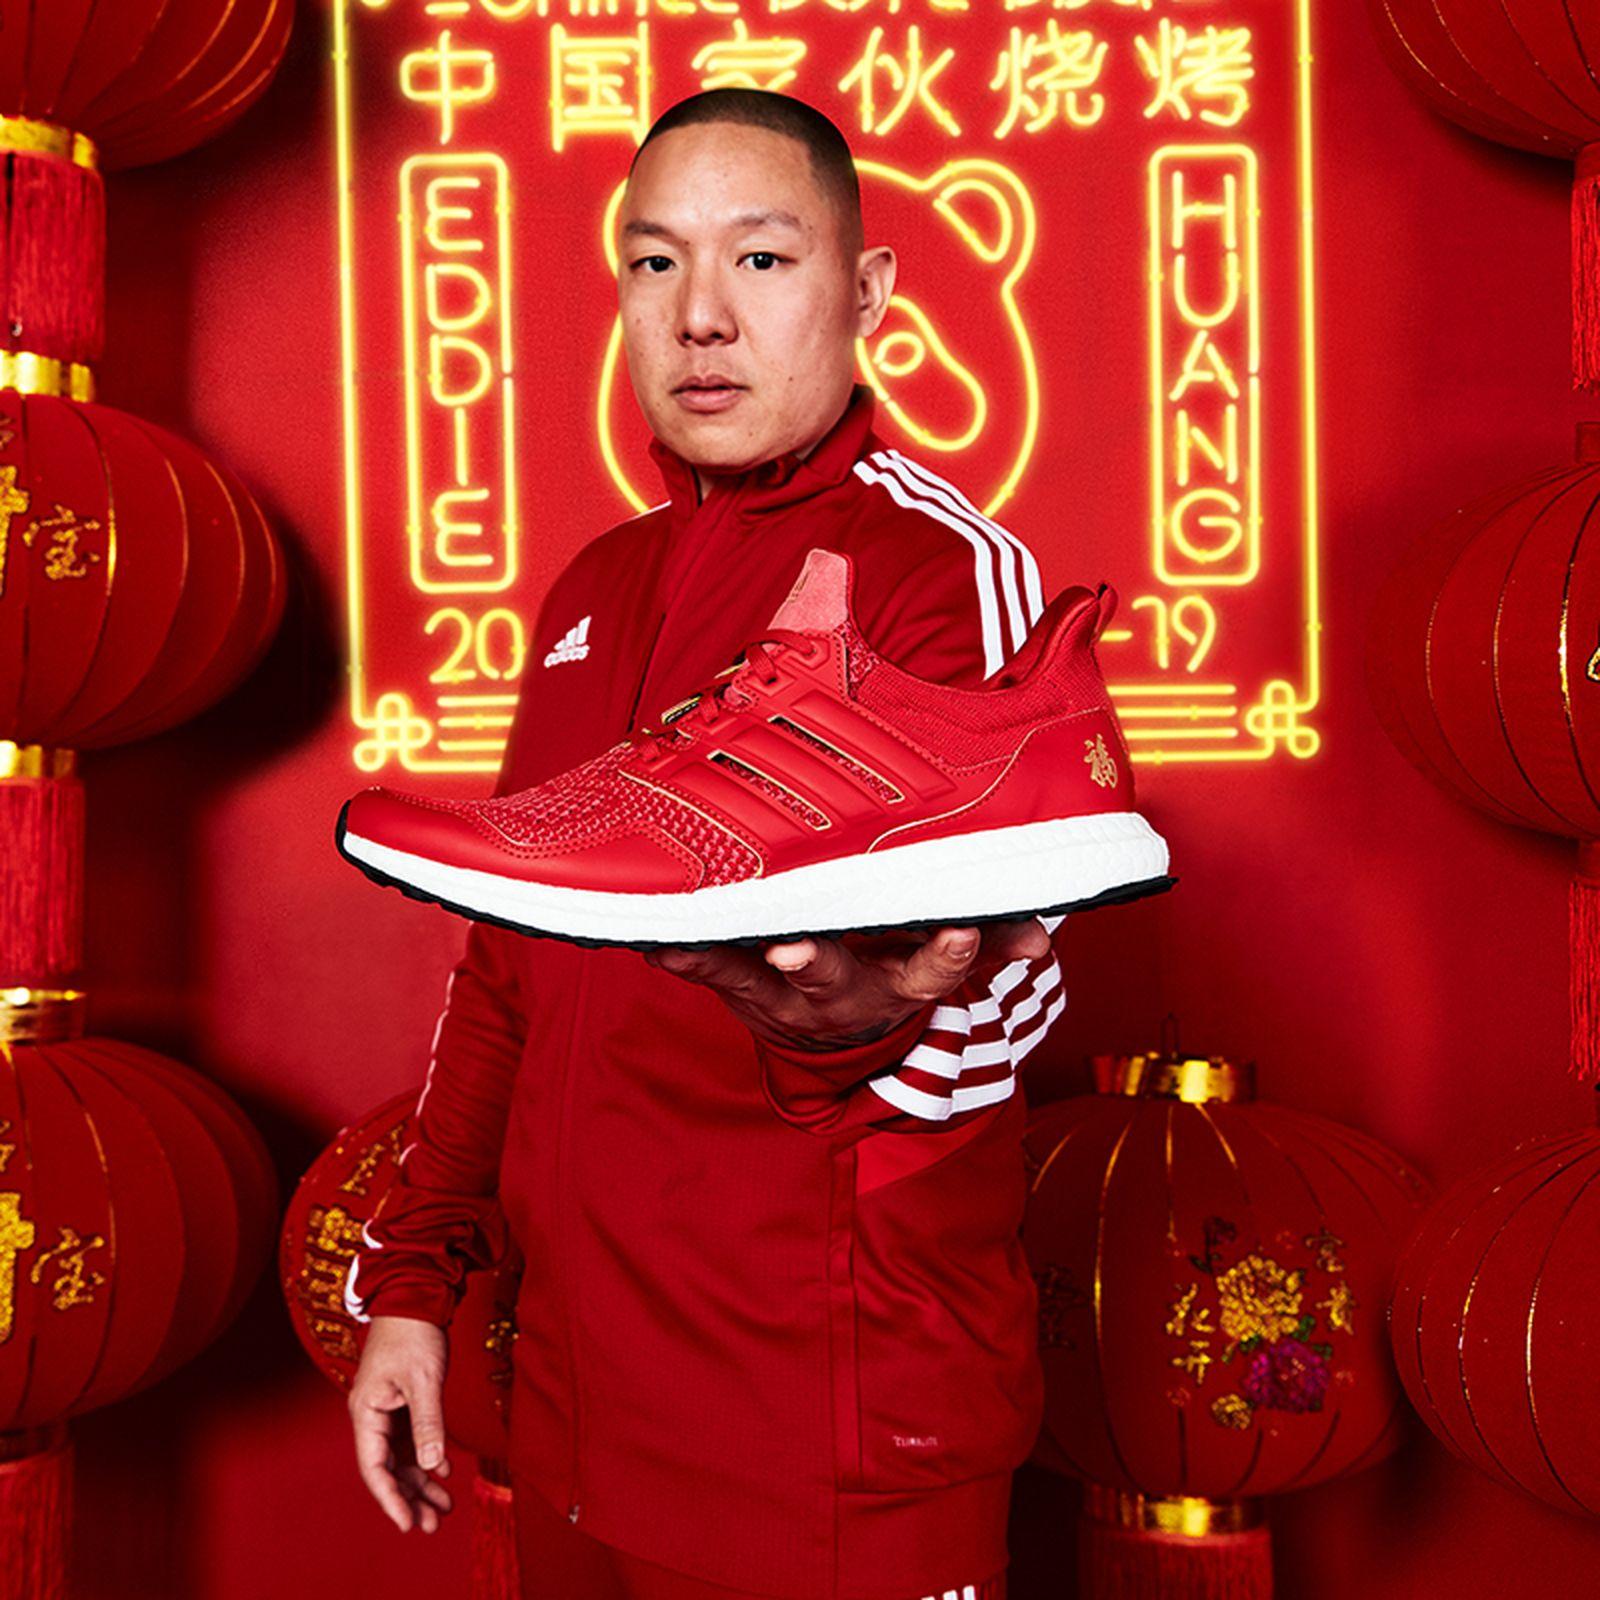 eddie huang adidas ultra boost release date price 1 adidas Originals